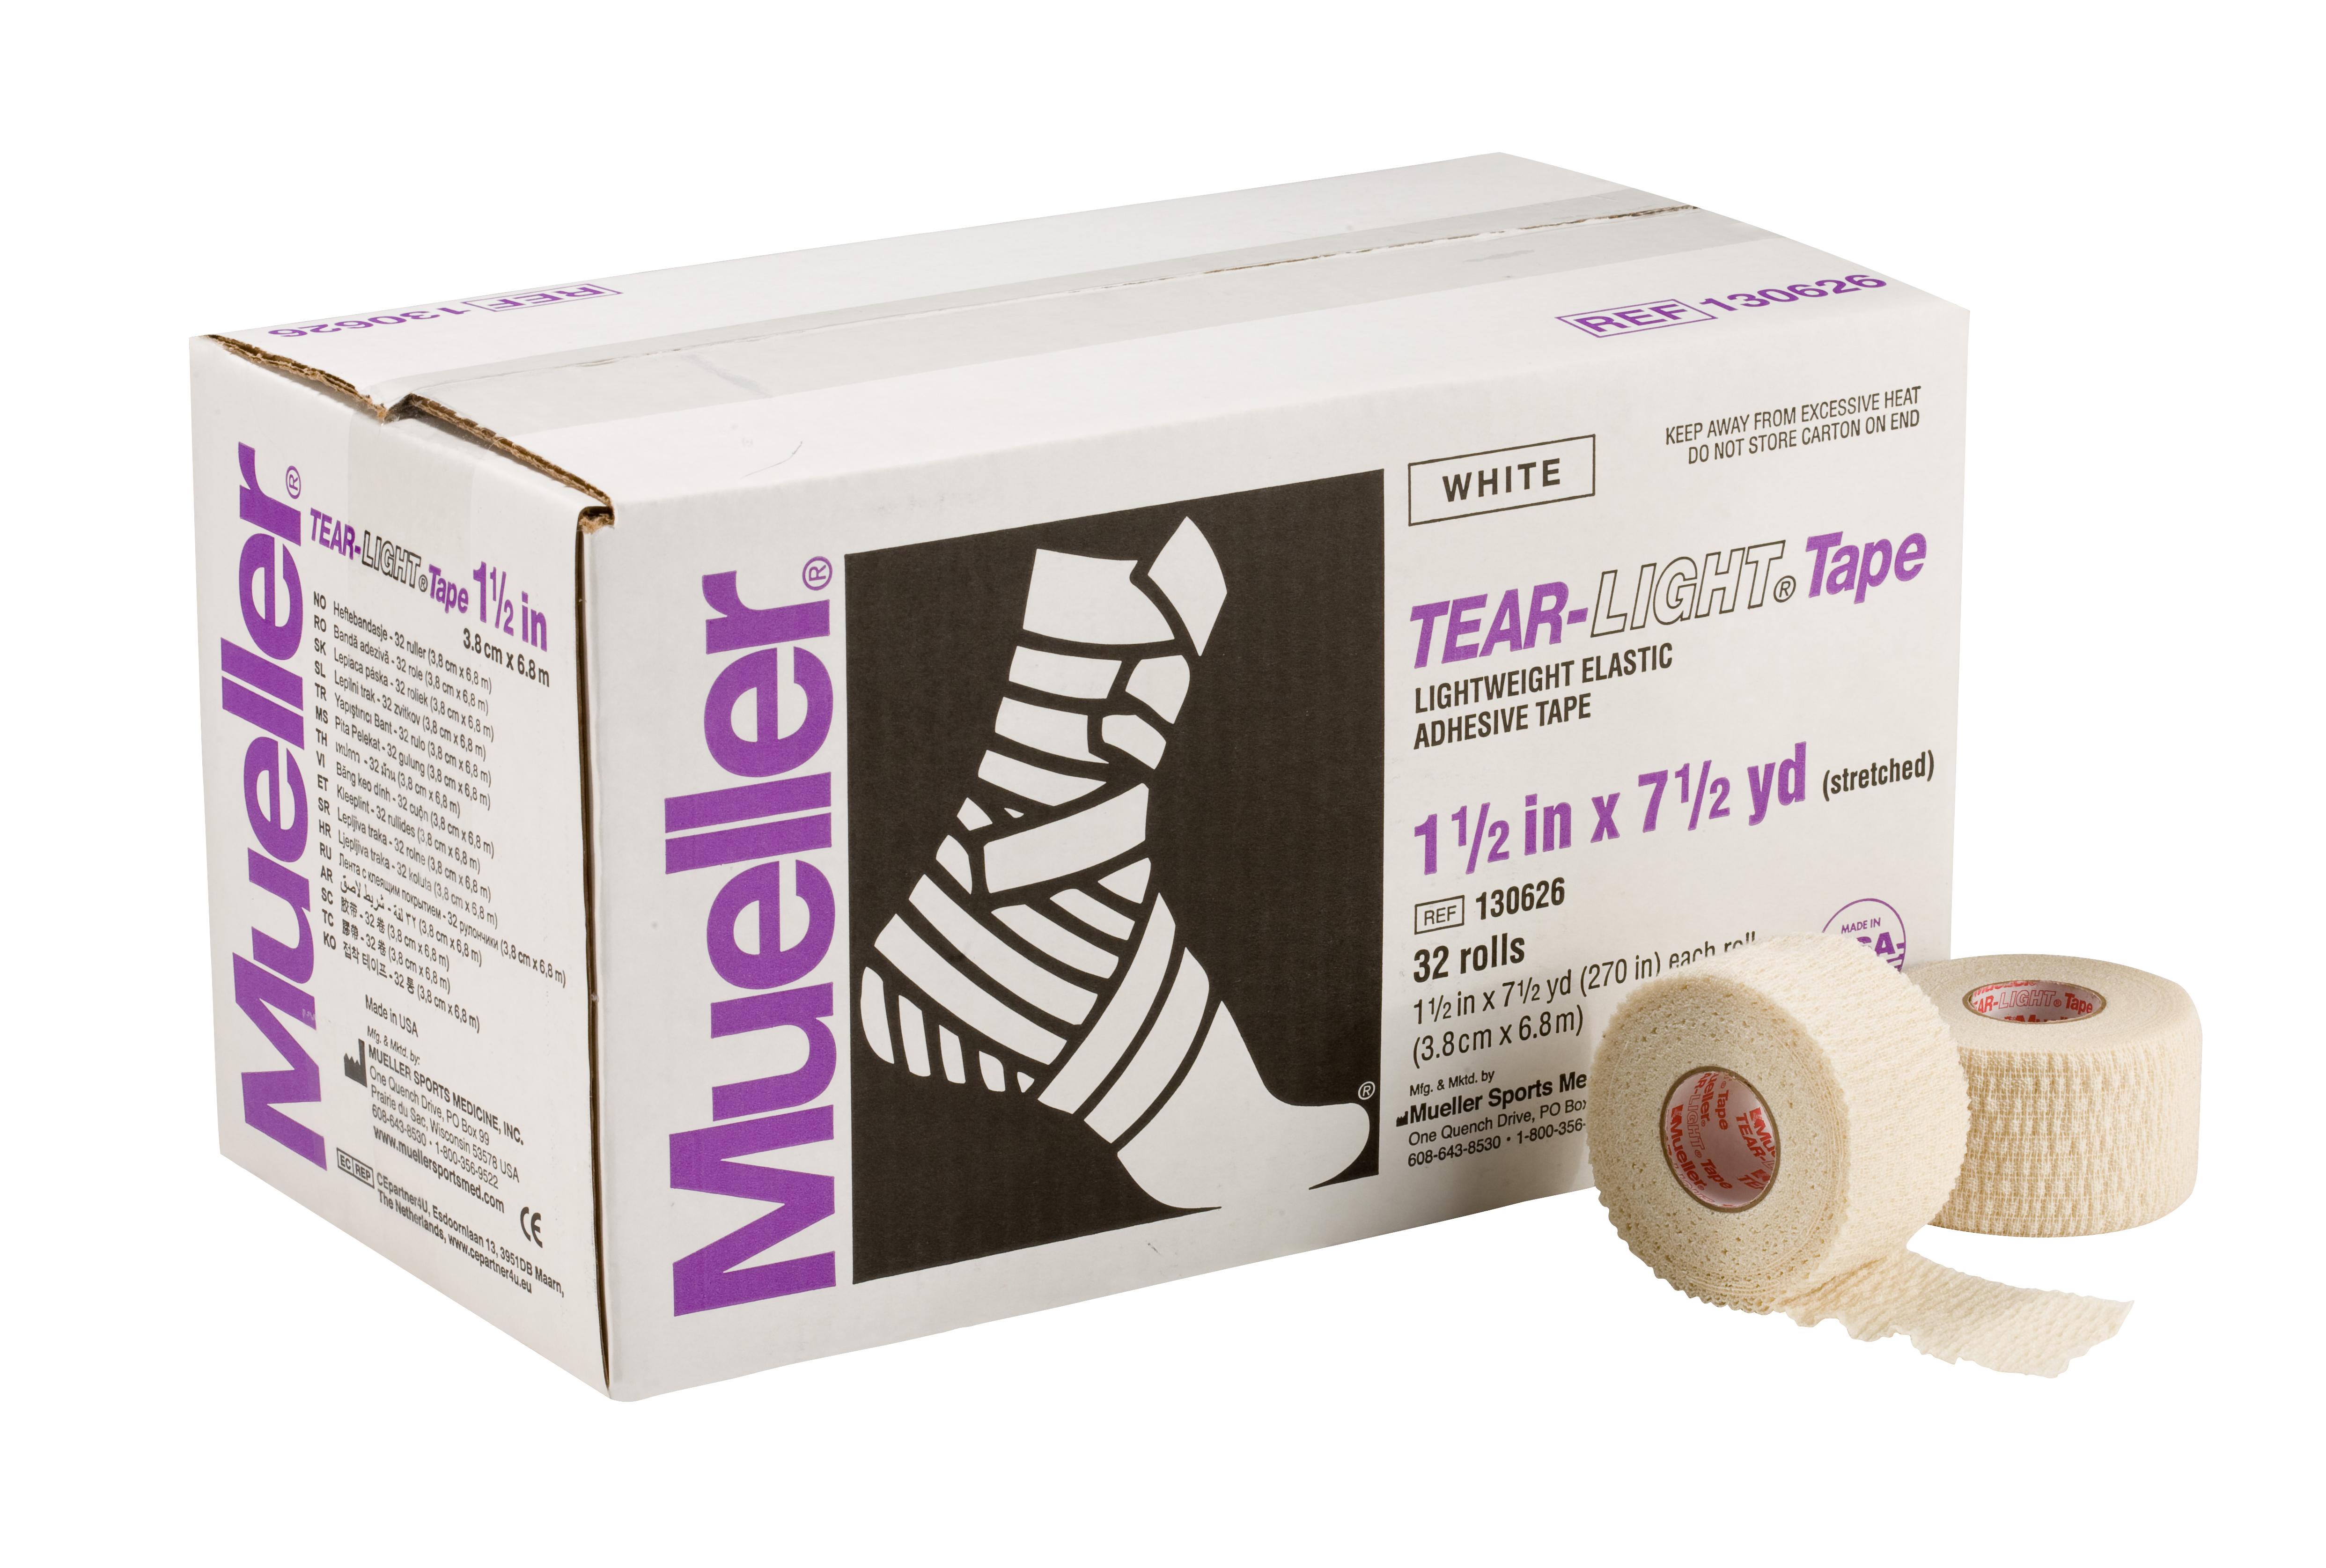 Mueller Tear-Light-Tape 6,9m - 3,8cm Weiß 32 Rollen